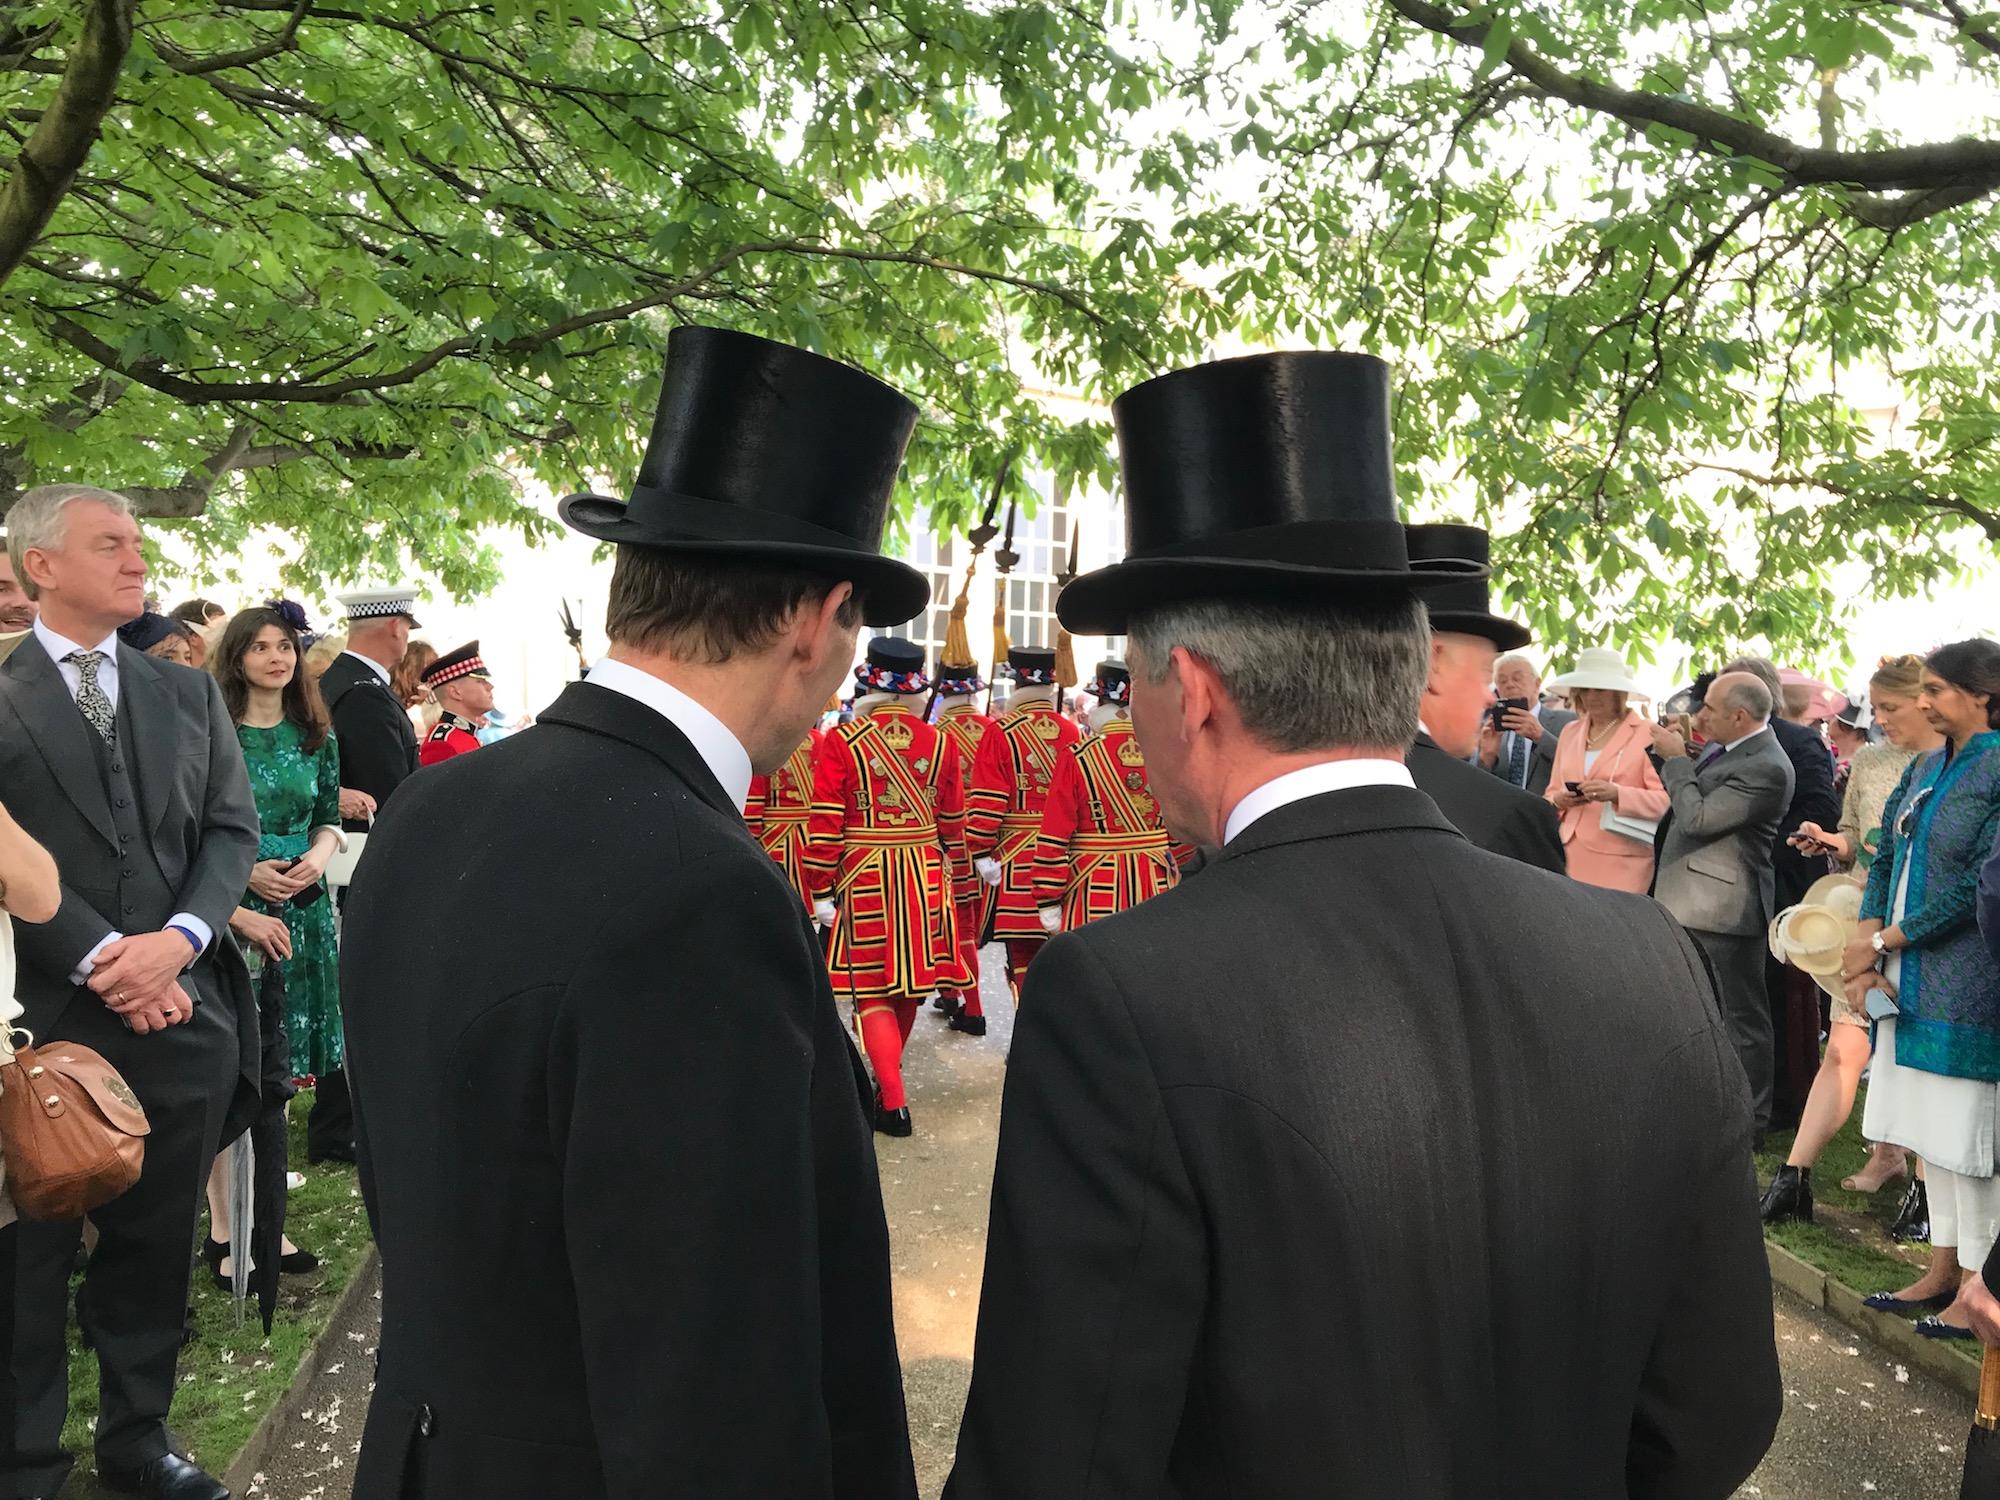 Men at Buckingham Palace.jpg